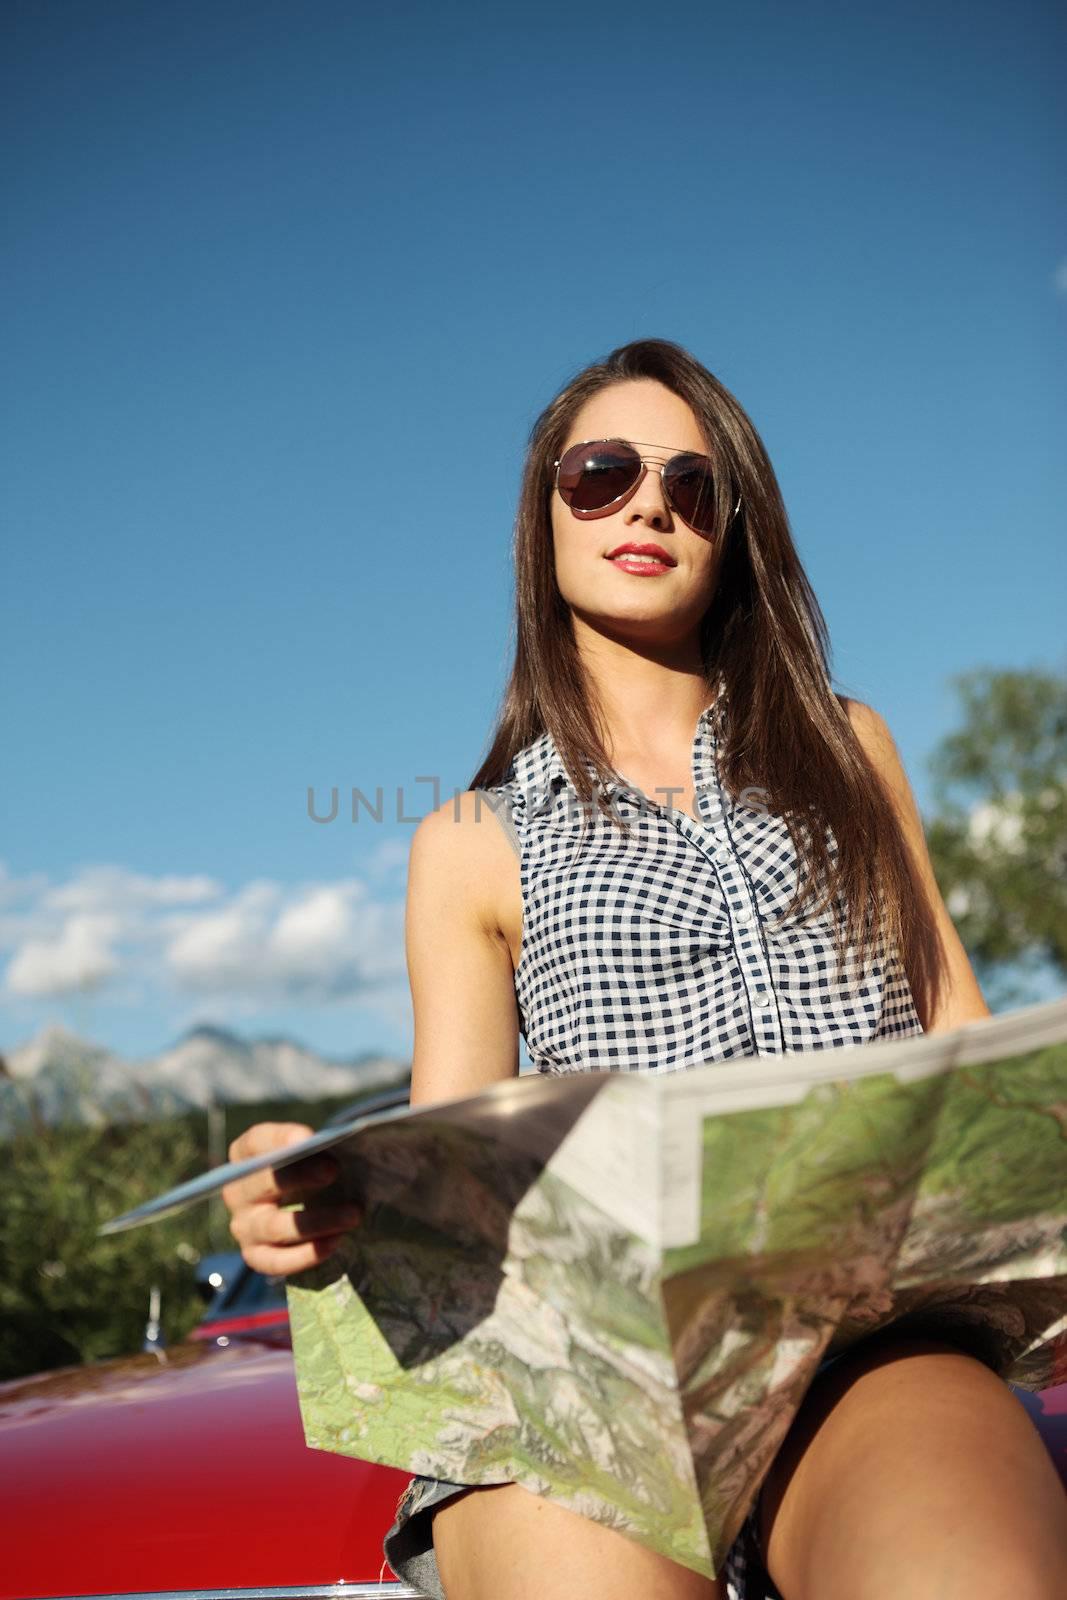 Young beautiful woman wearing sunglasses reading a roadmap